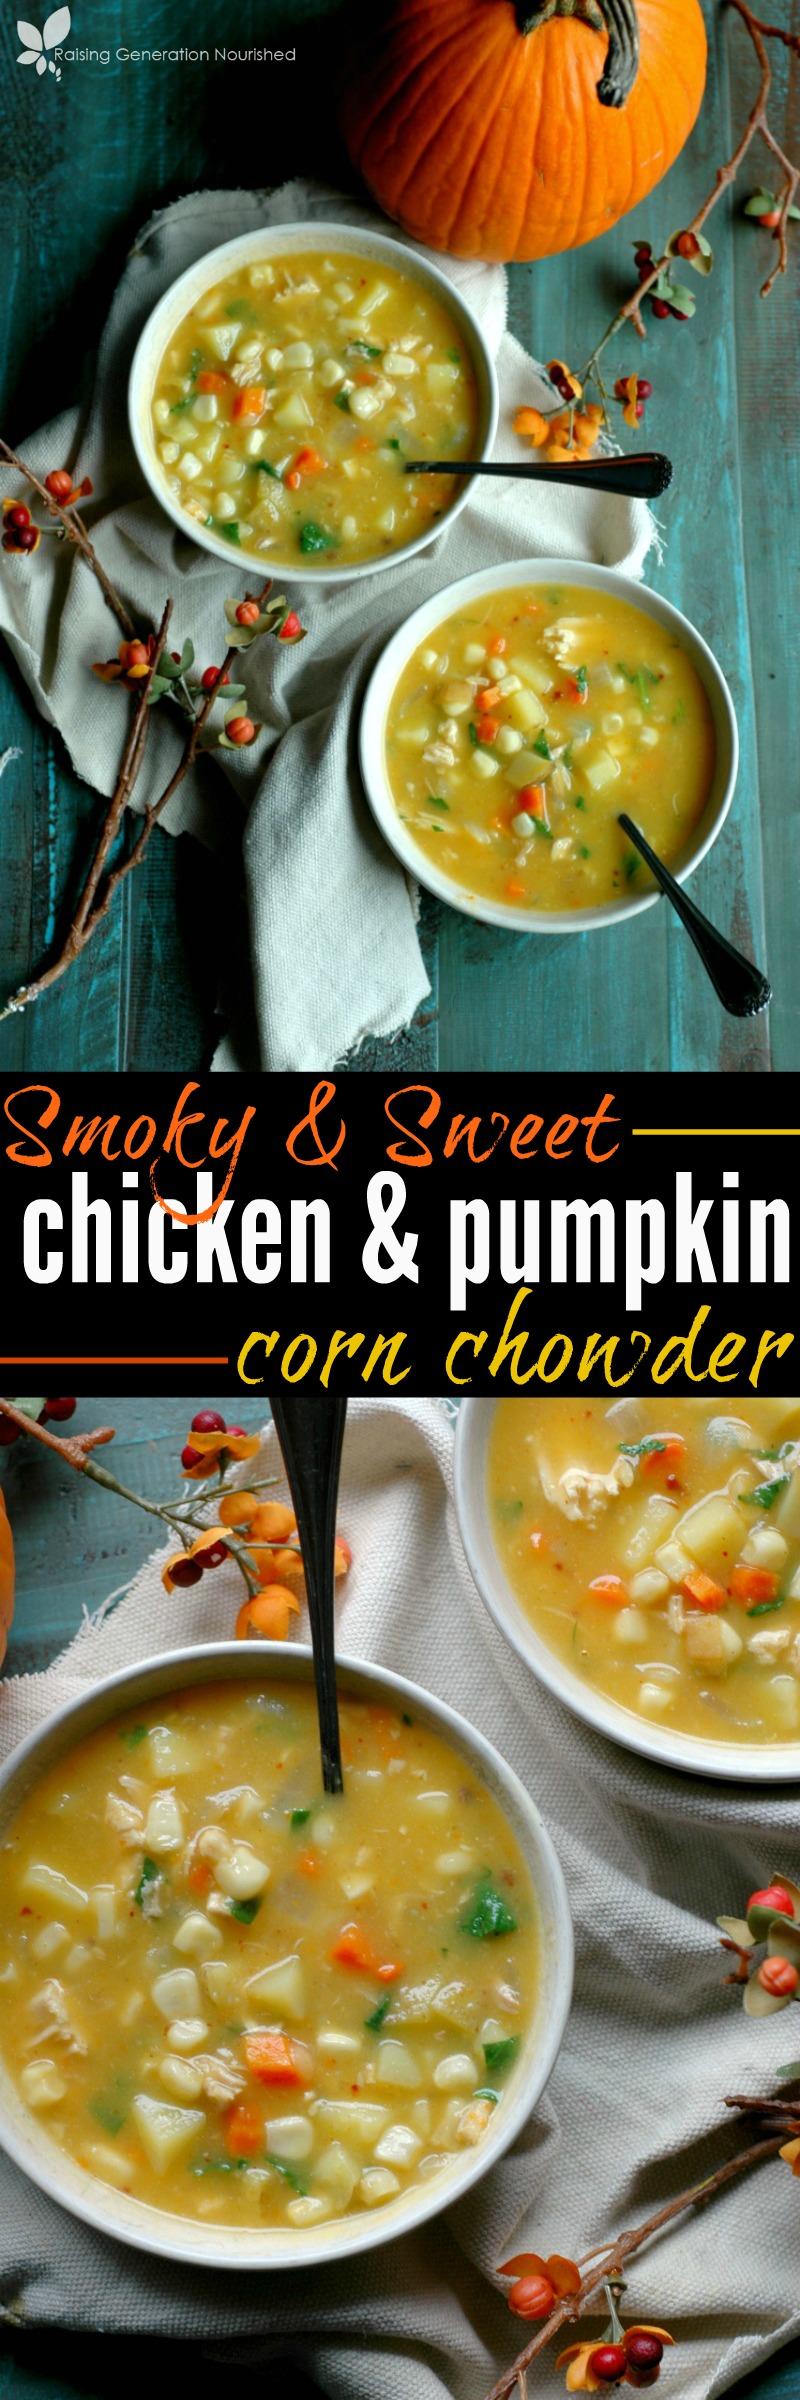 Smoky & Sweet Chicken & Pumpkin Corn Chowder :: Creamy and comforting meets the savory heat of chipotle in this sweet and smoky chicken and pumpkin corn chowder!